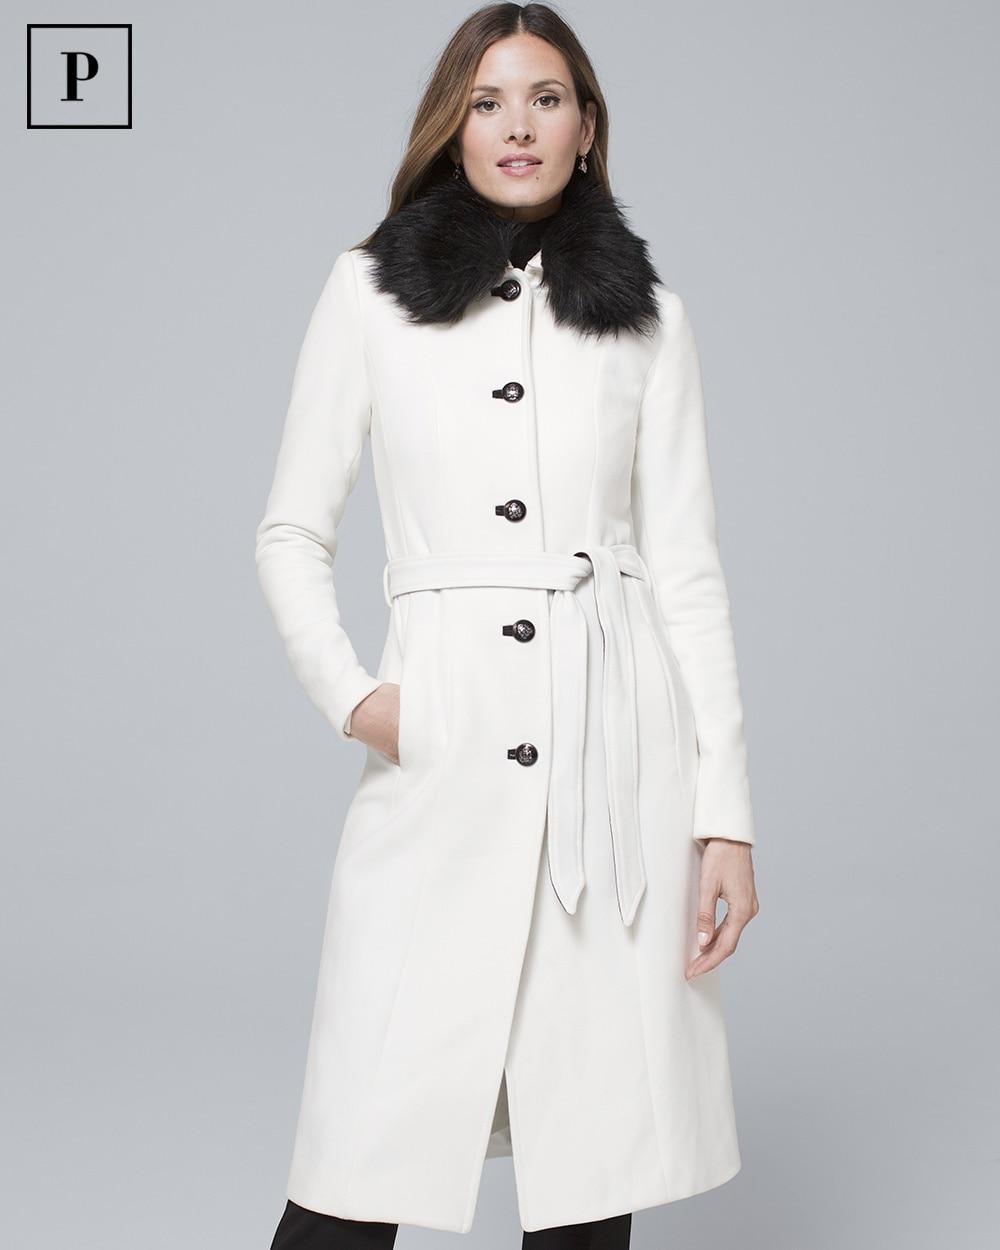 79e91d03573f5 Petite Removable Faux Fur-Collar Coat - White House Black Market